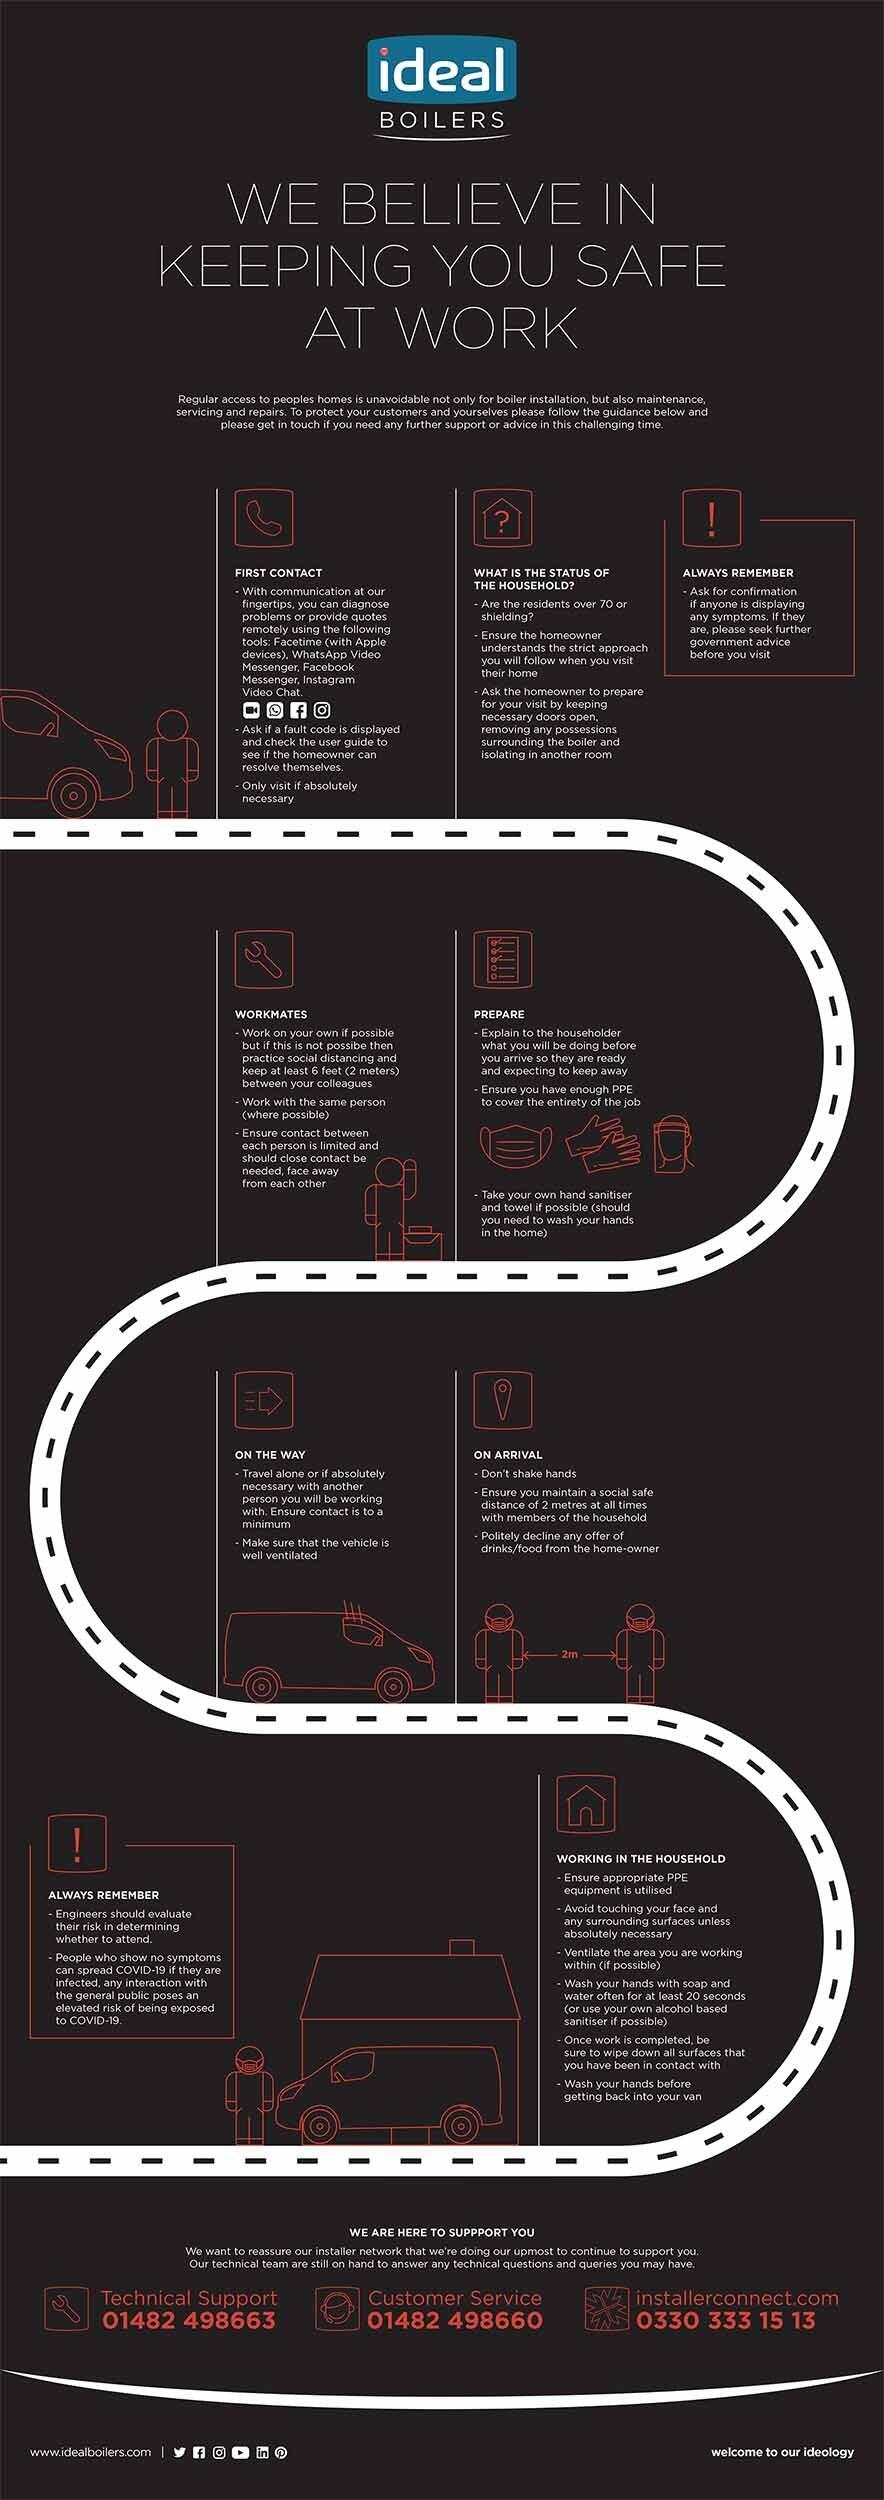 Coronavirus Guidance For Installers Infographic